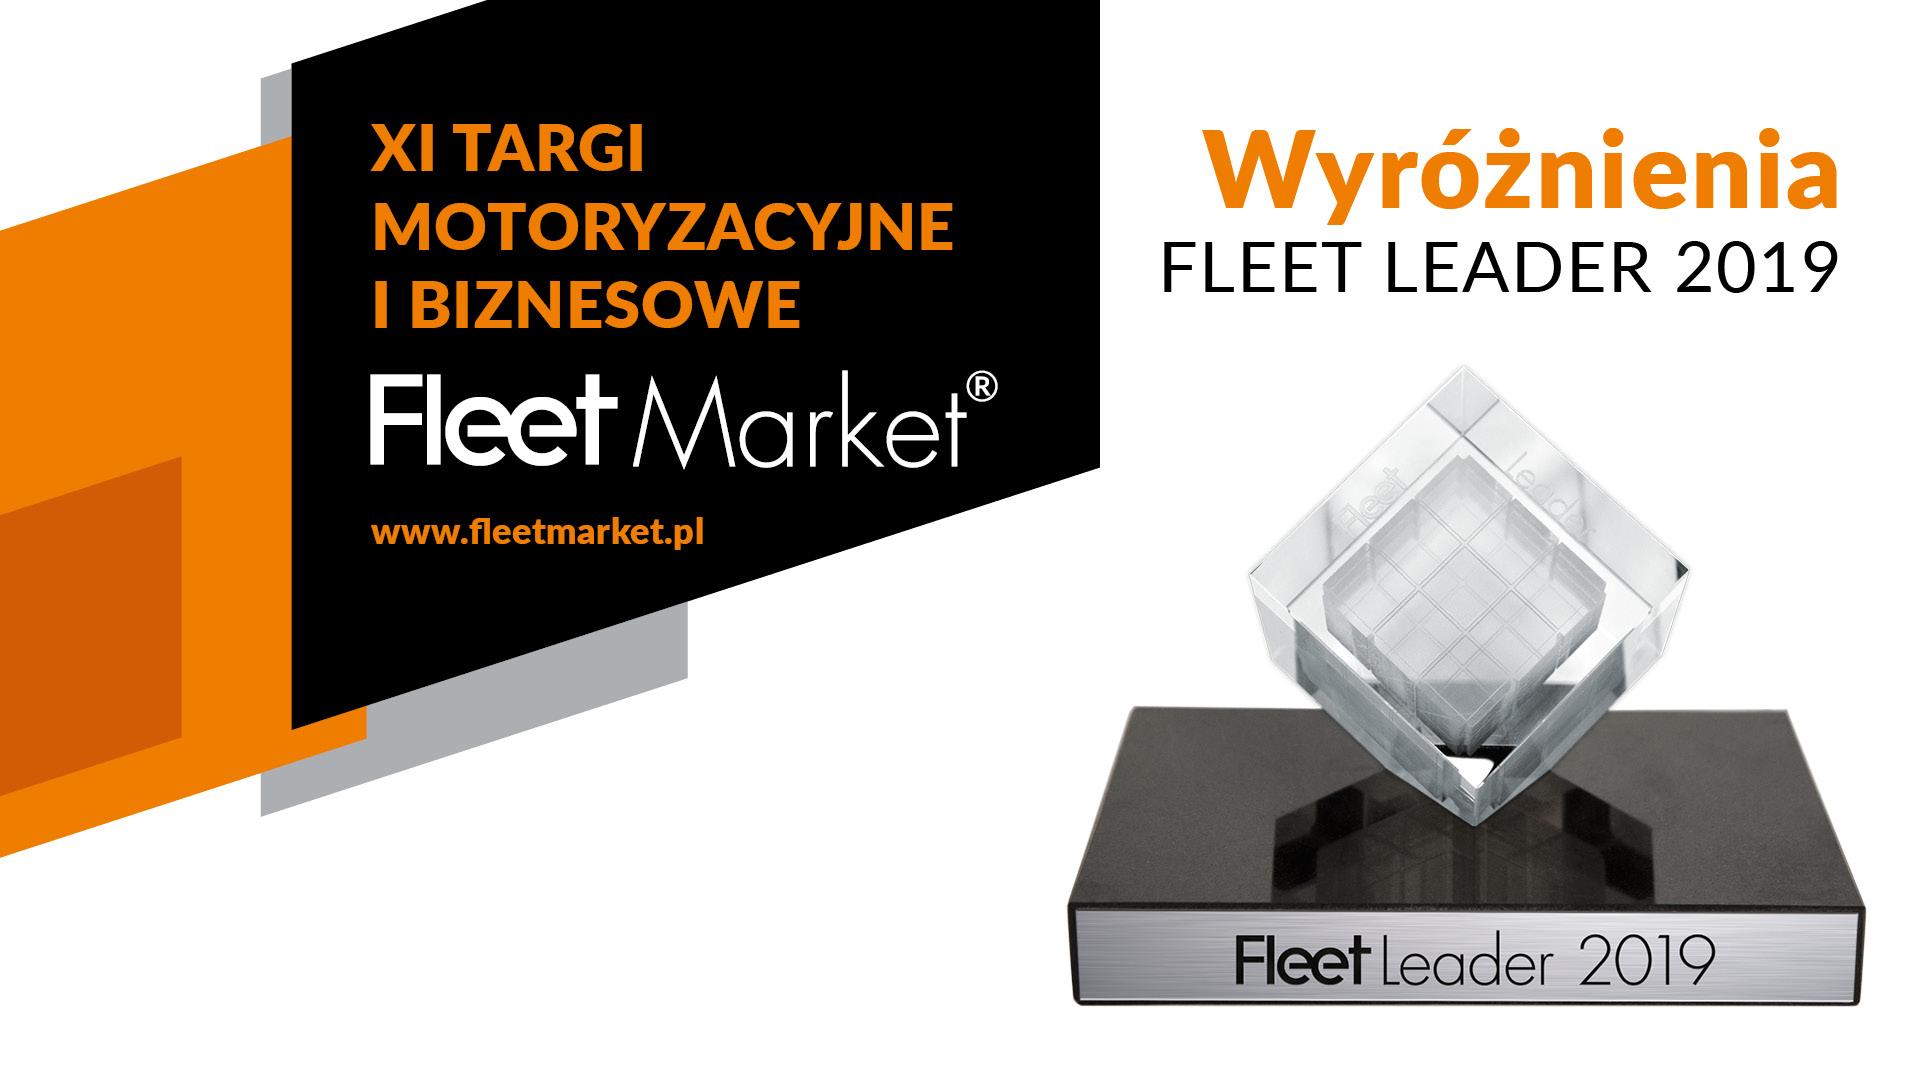 Fleet Leader 2019 - laureaci